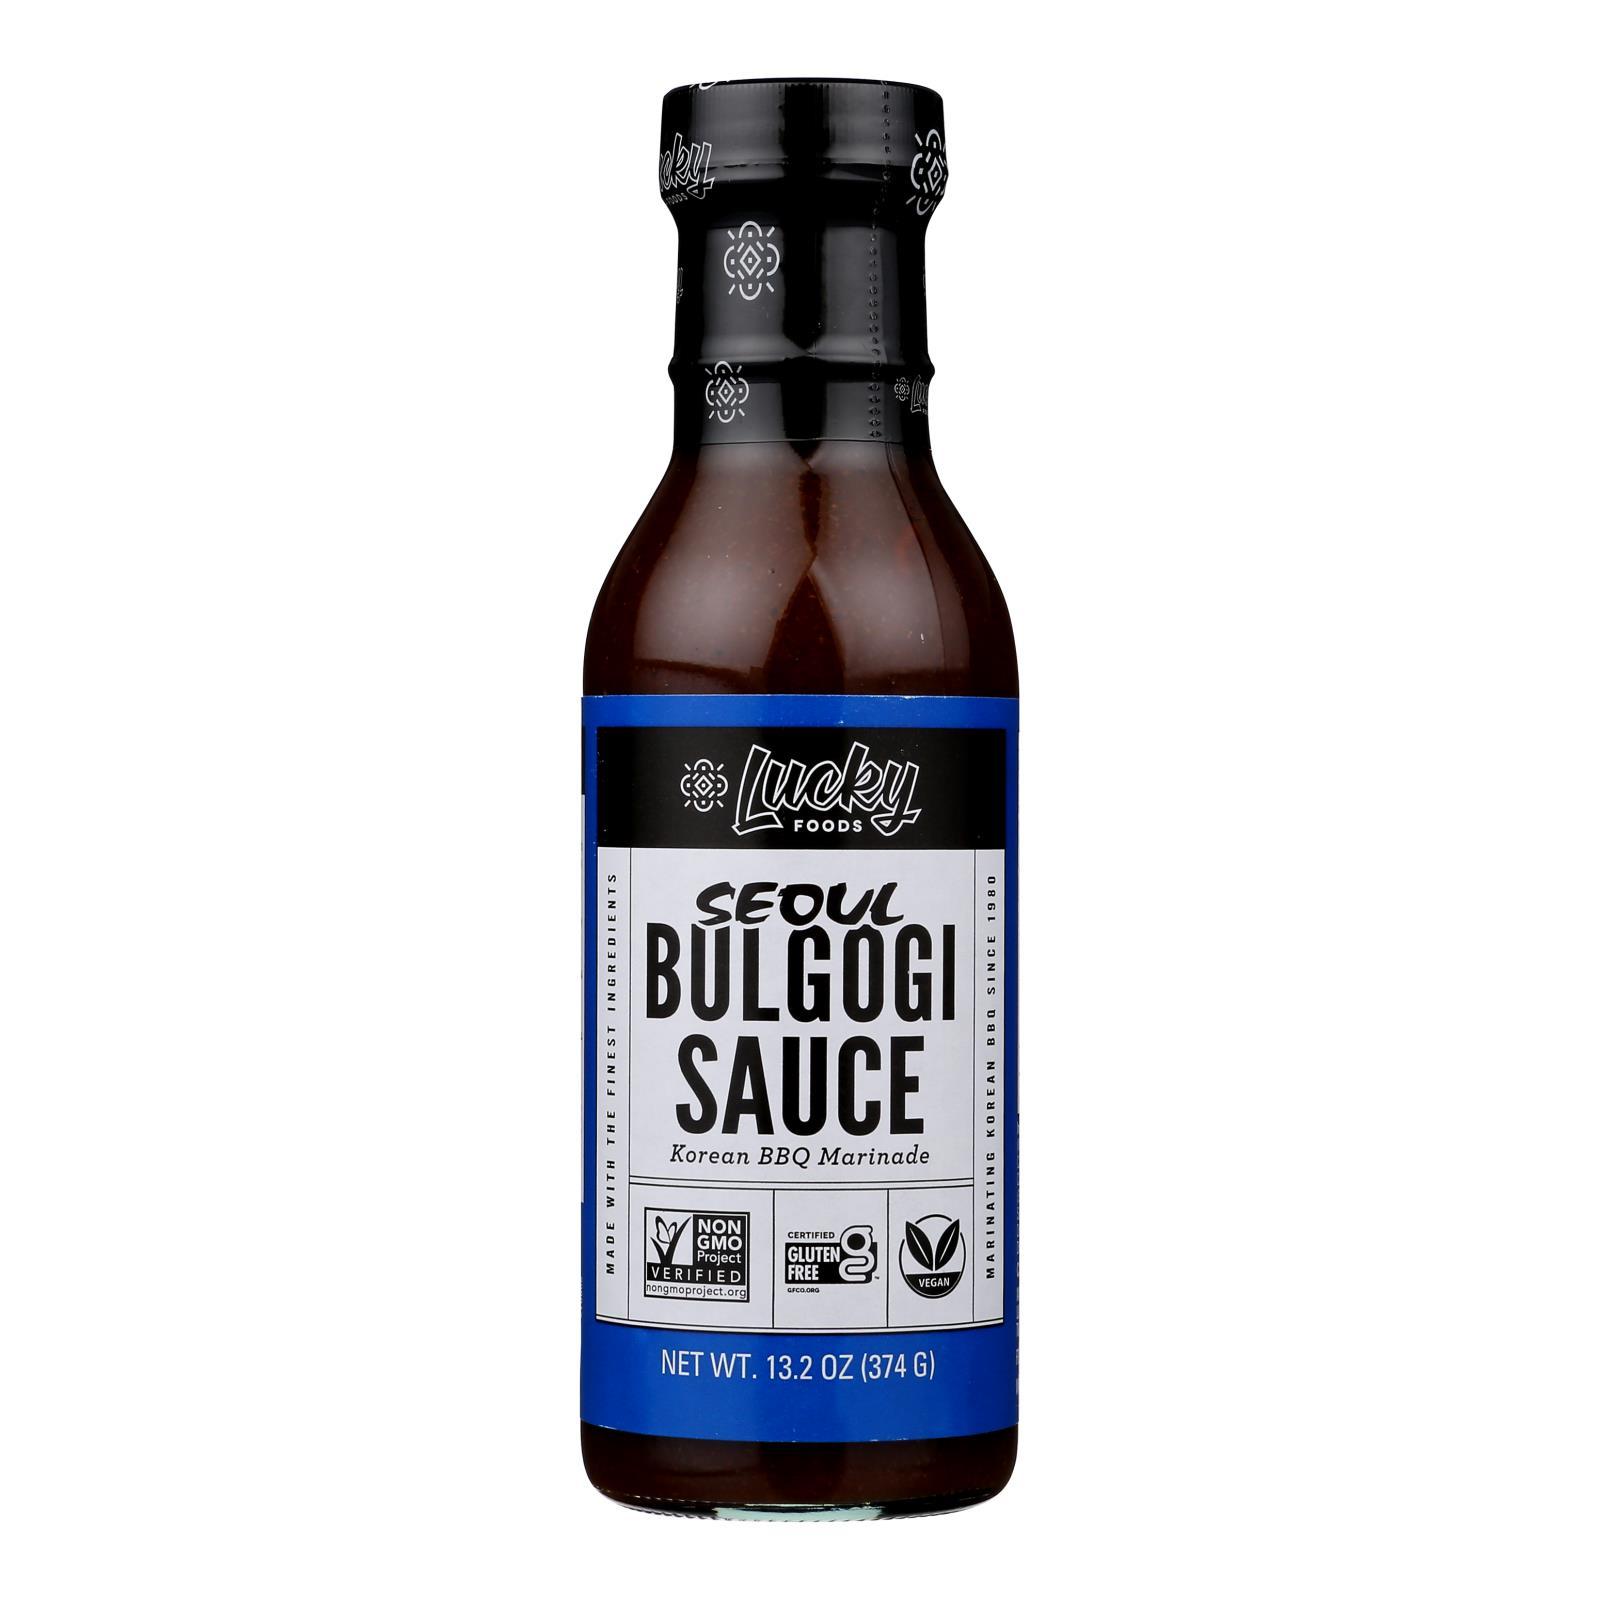 Seoul Bulgogi Sauce - Case of 6 - 13.2 OZ